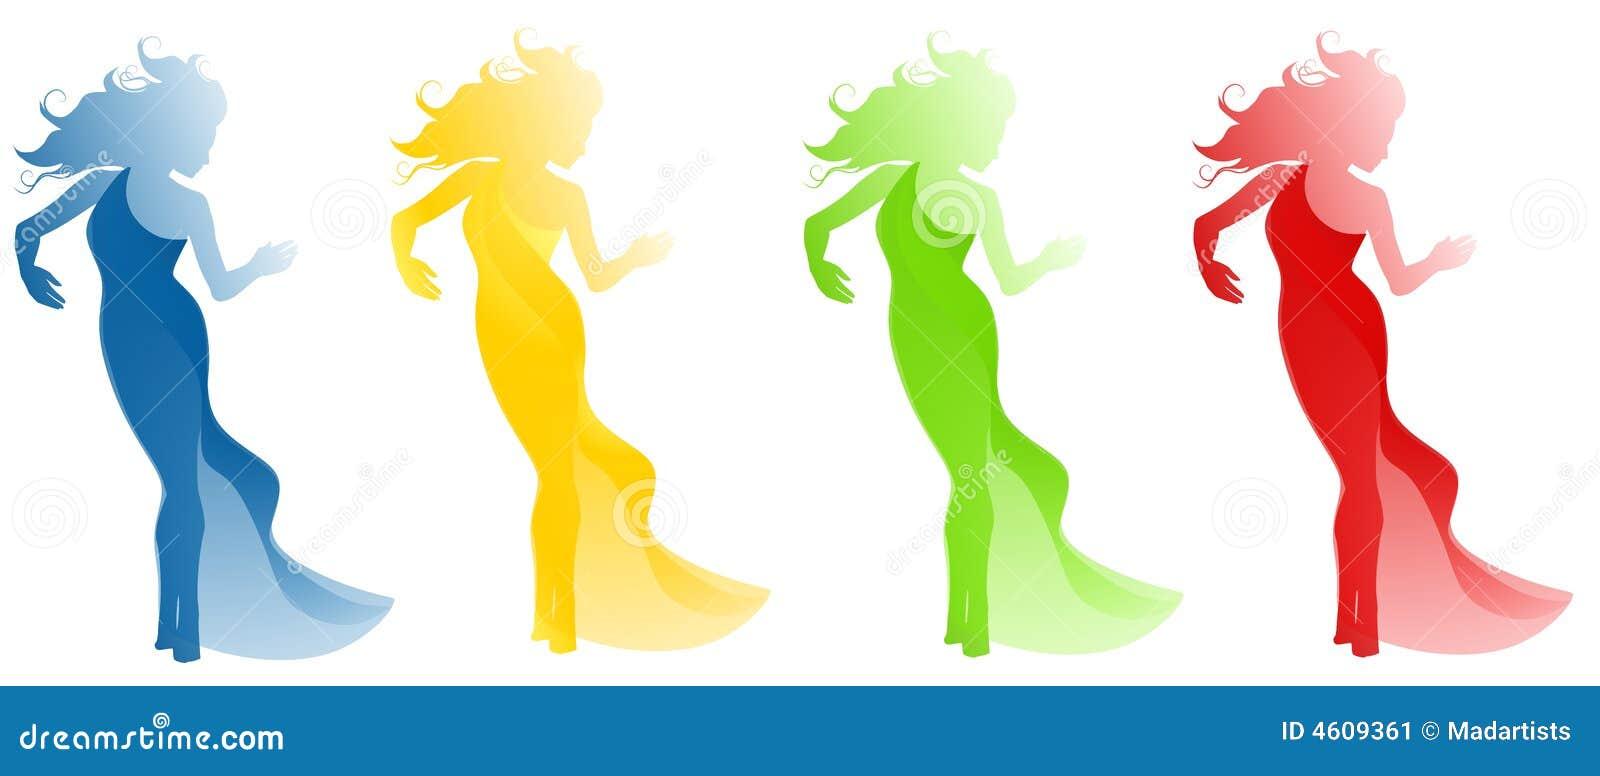 female fashion clip art stock image image 4609361 Rain Clip Art Foggy' Clip Art